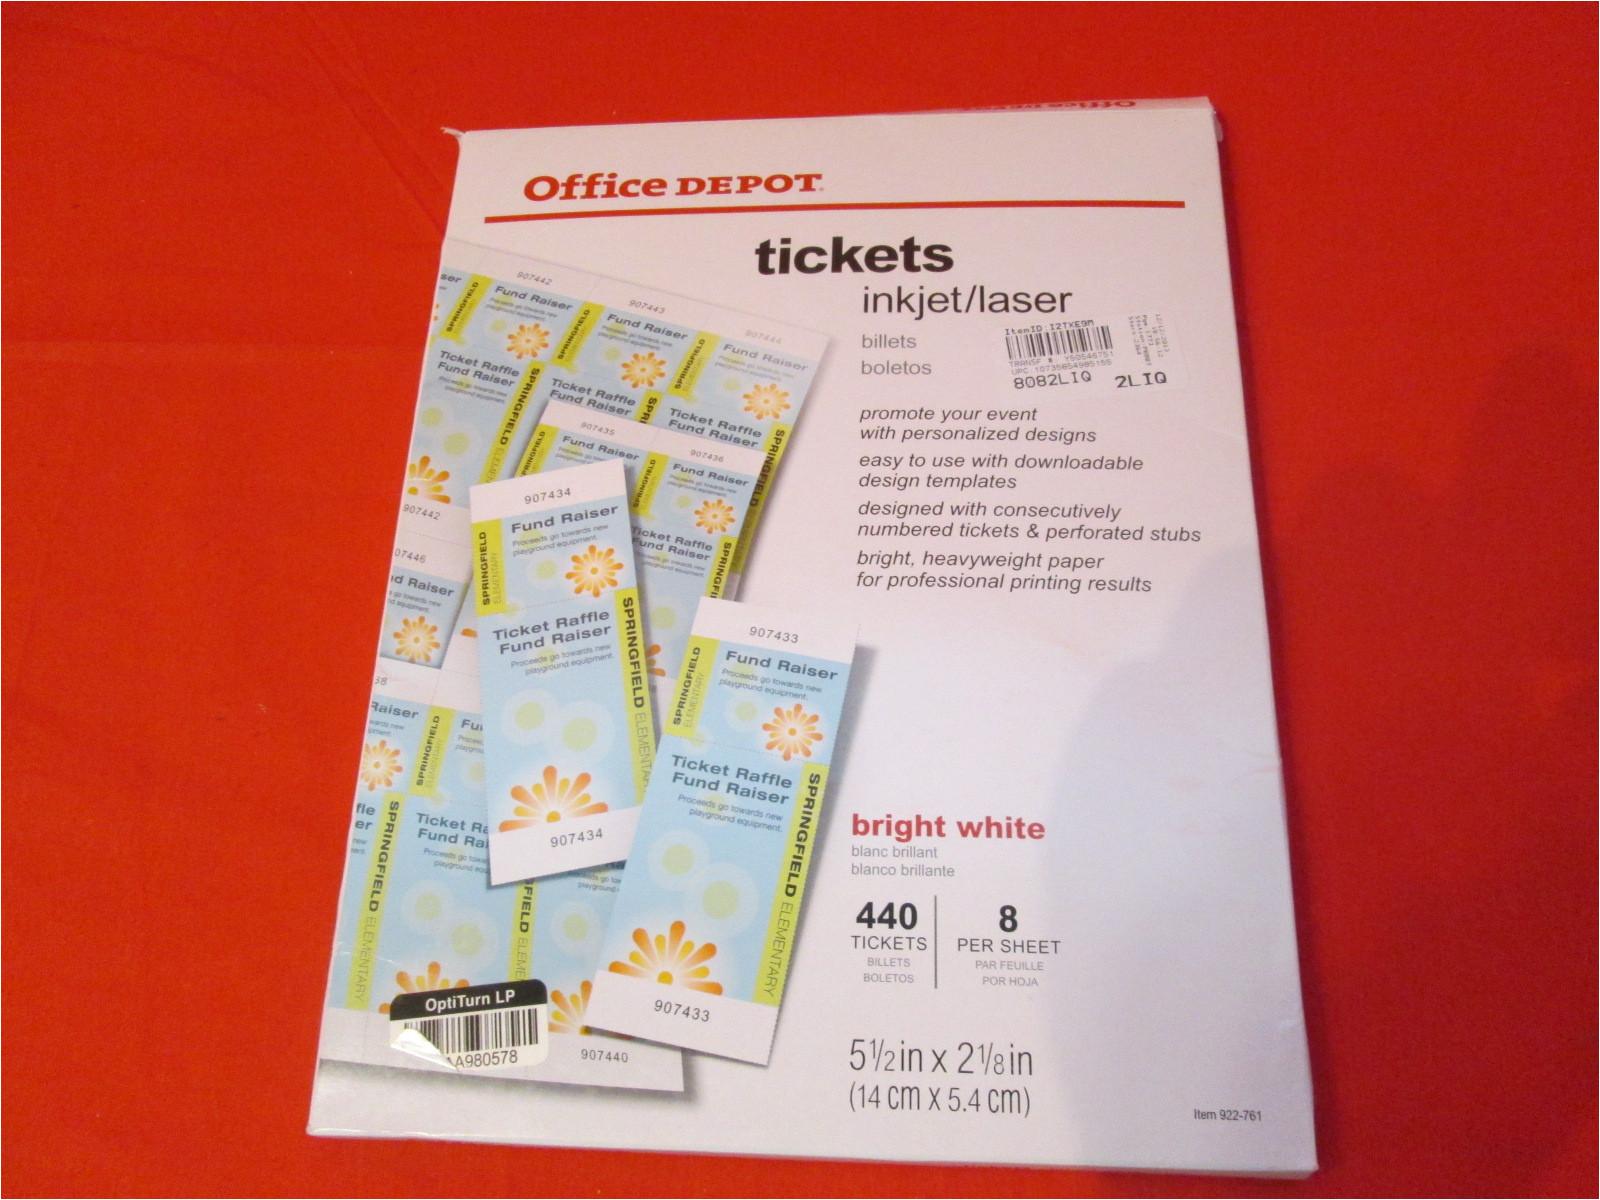 office depot laser inkjet tickets pack of 440 tickets